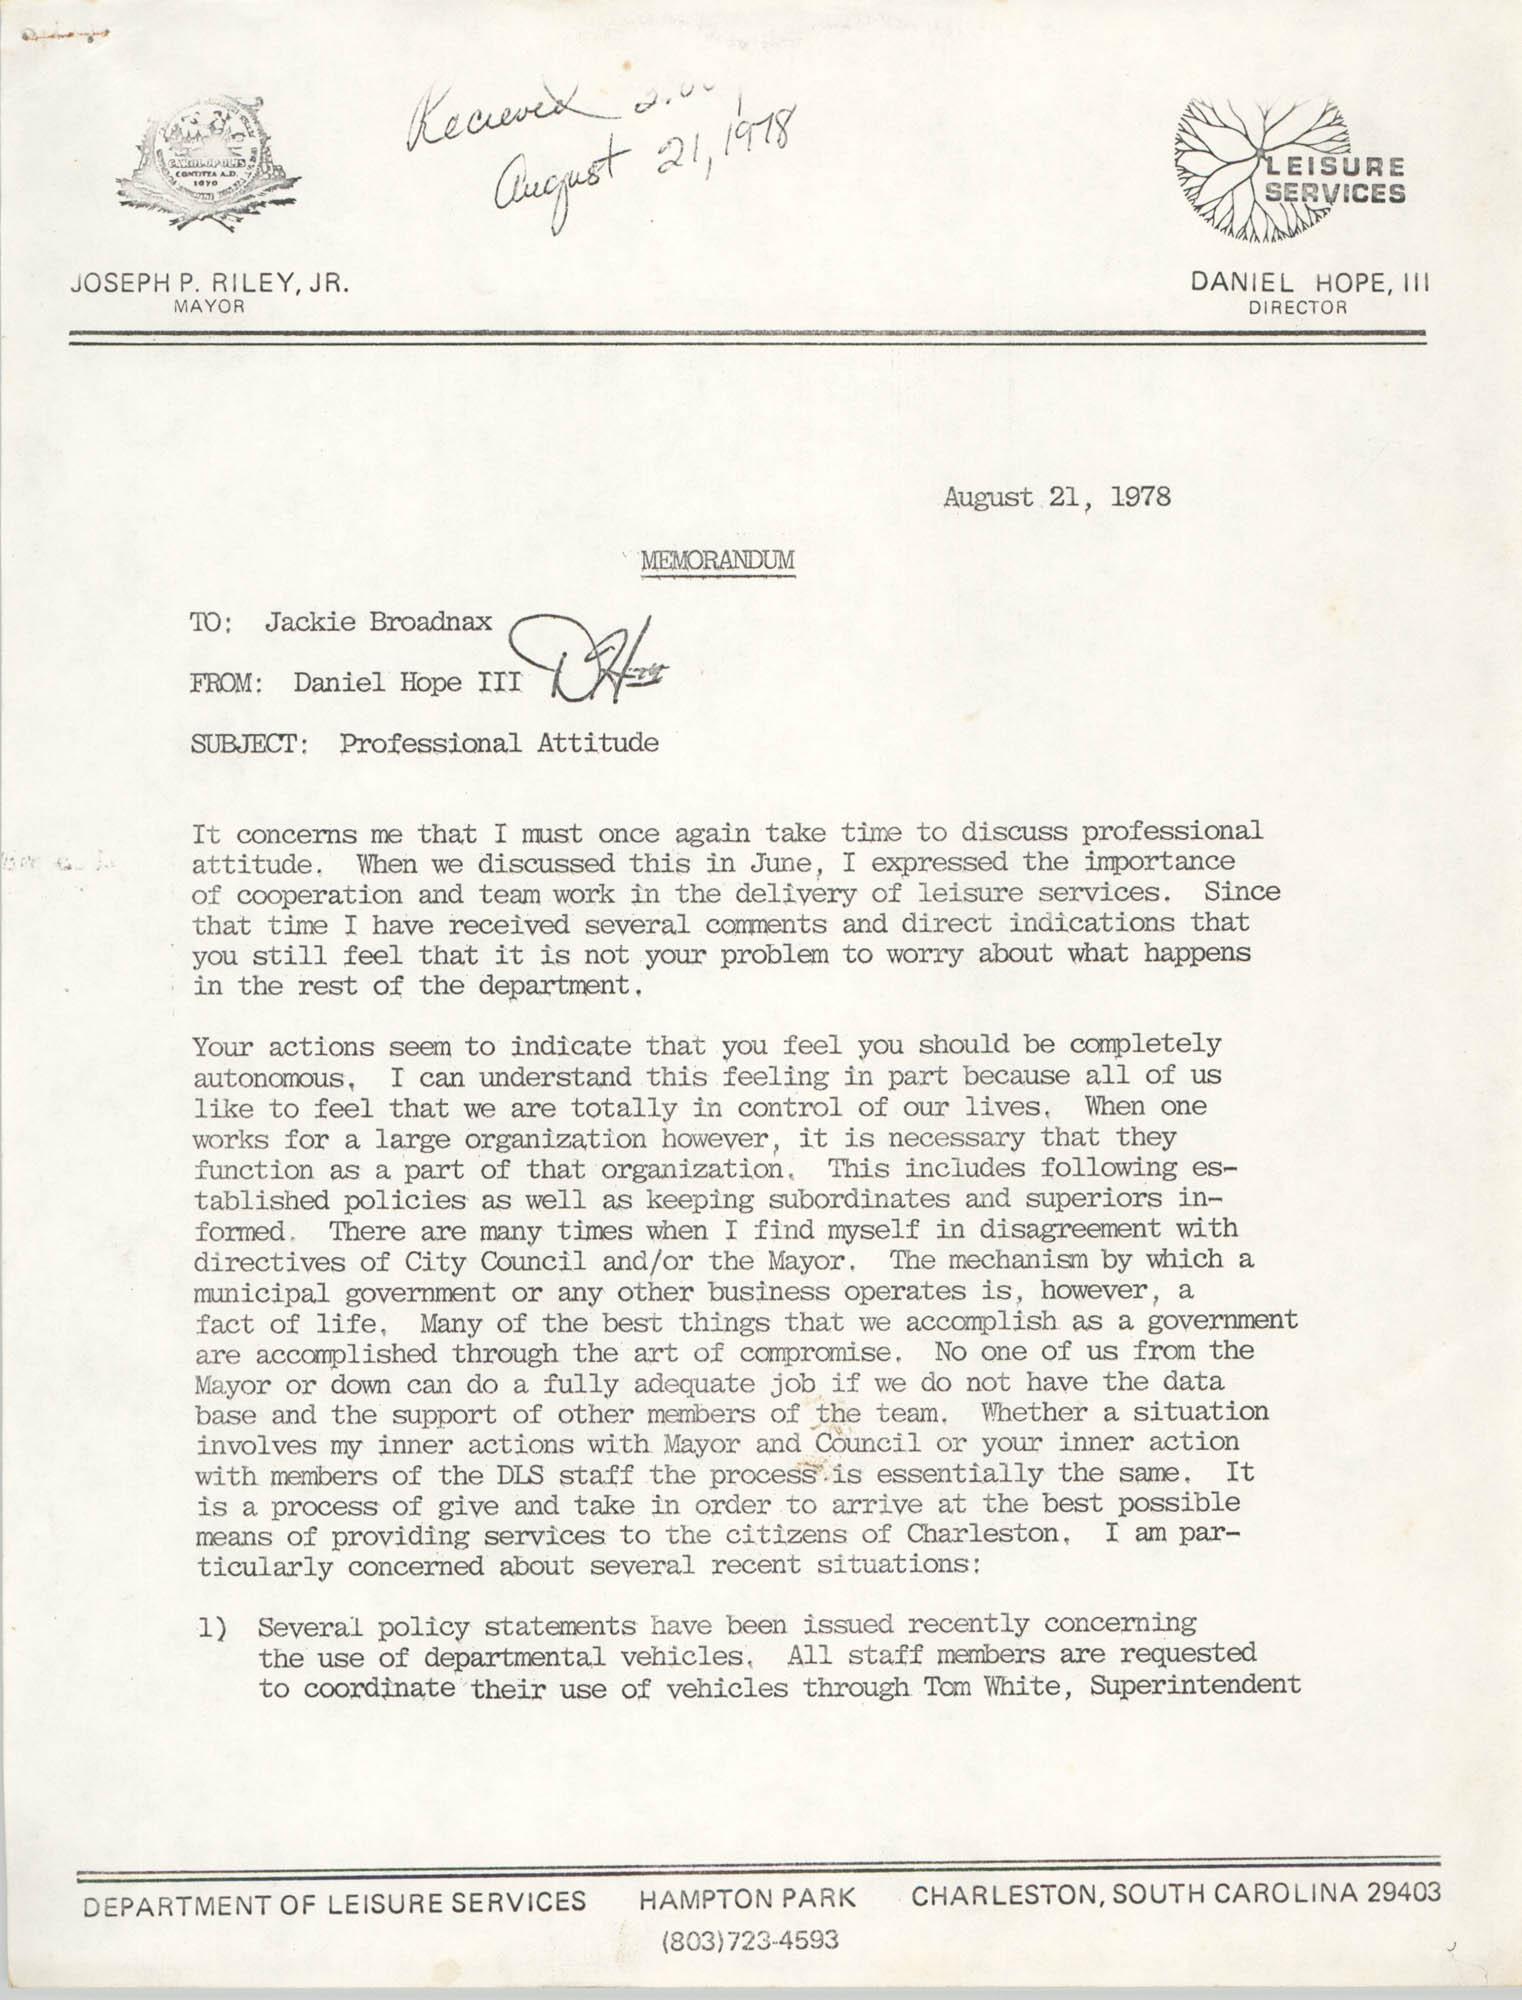 City of Charleston Department of Leisure Services Memorandum, August 21, 1978